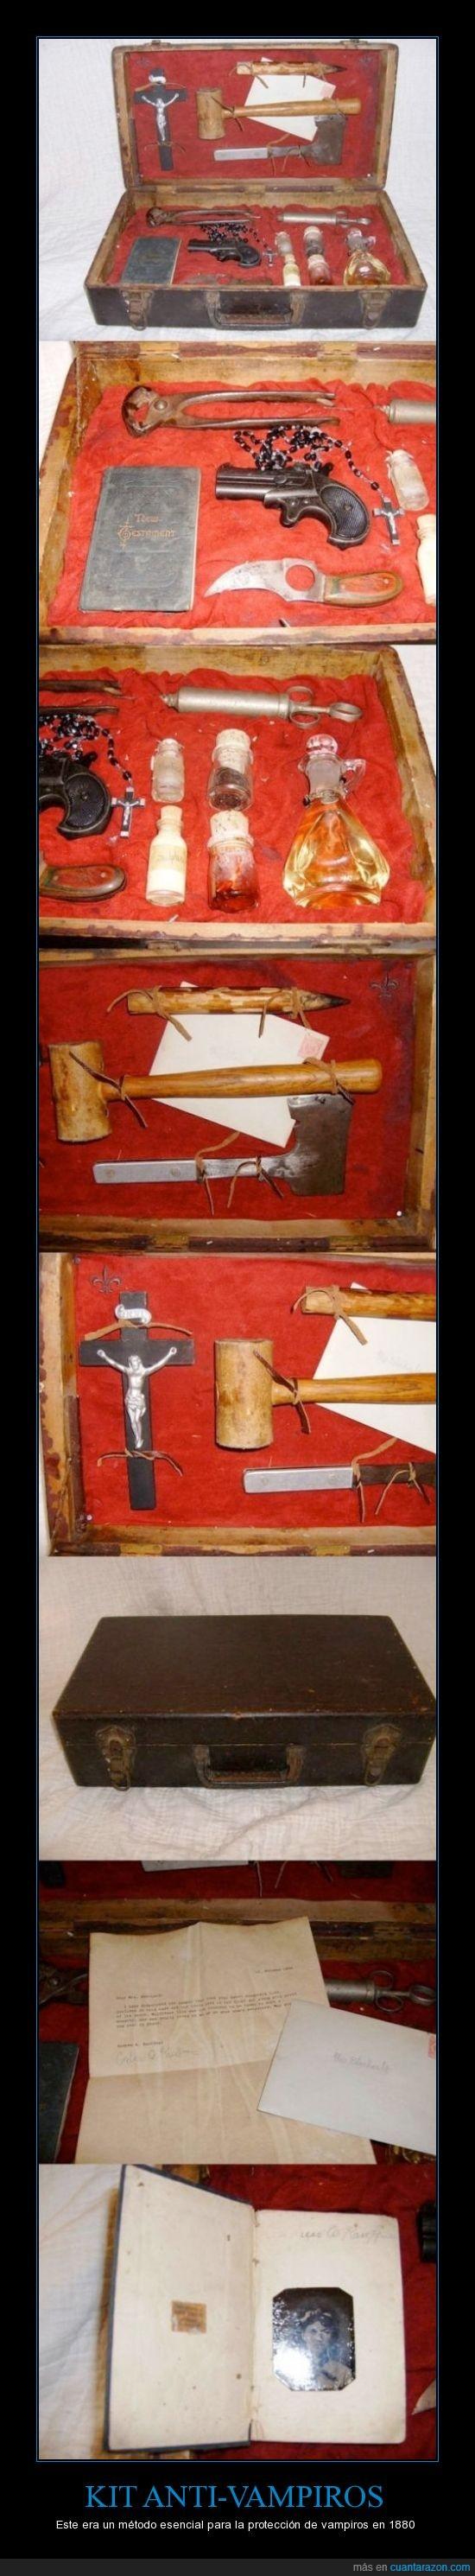 1880,agua bendita,cruz,estaca,fabricación en vano,kit,real,Vampiros